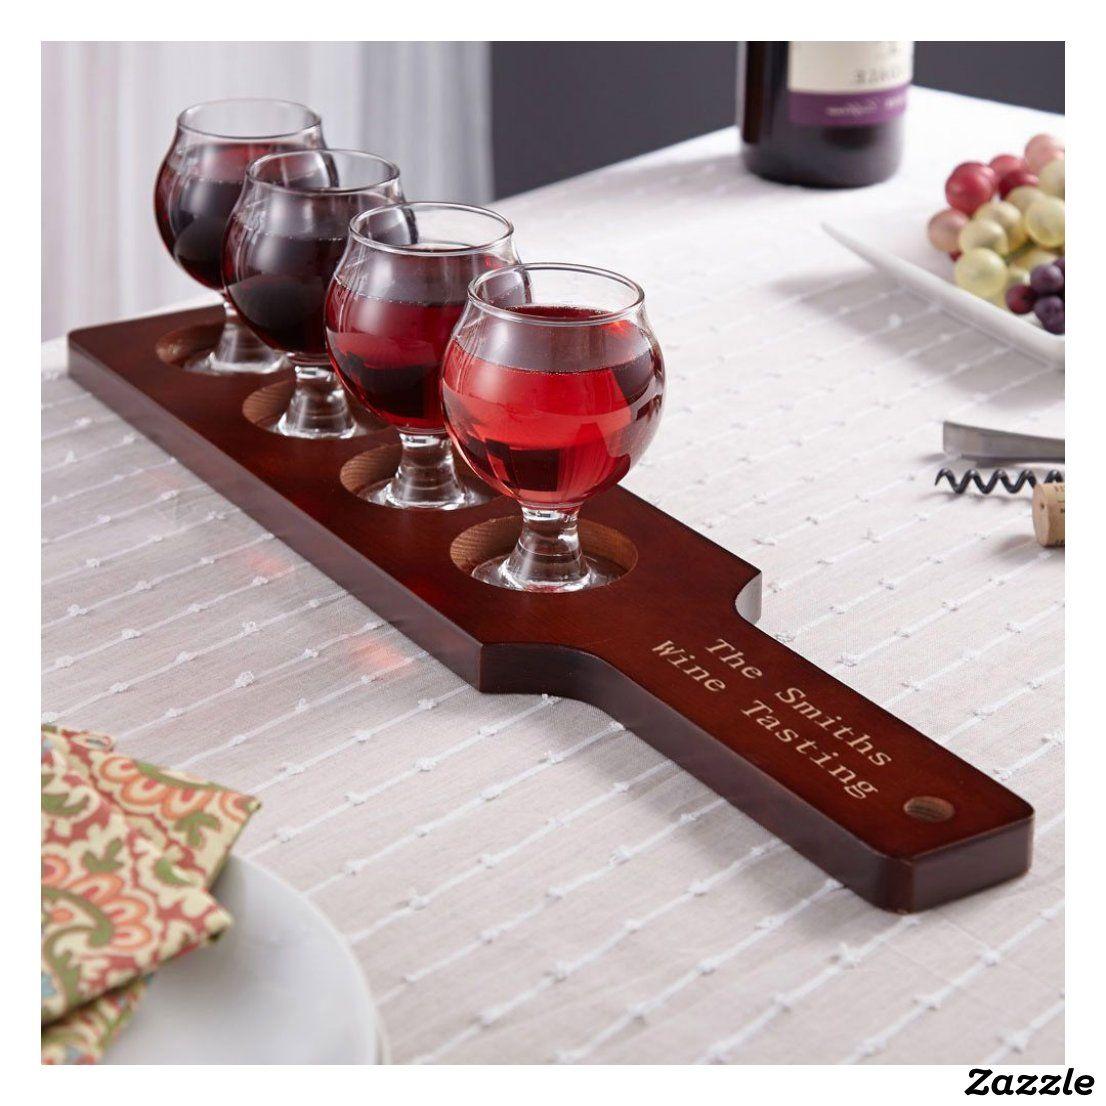 Unique Engraved Wooden Flight With Wine Glasses Zazzle Com In 2020 Wine Wine Tasting Party Unique Wine Glass